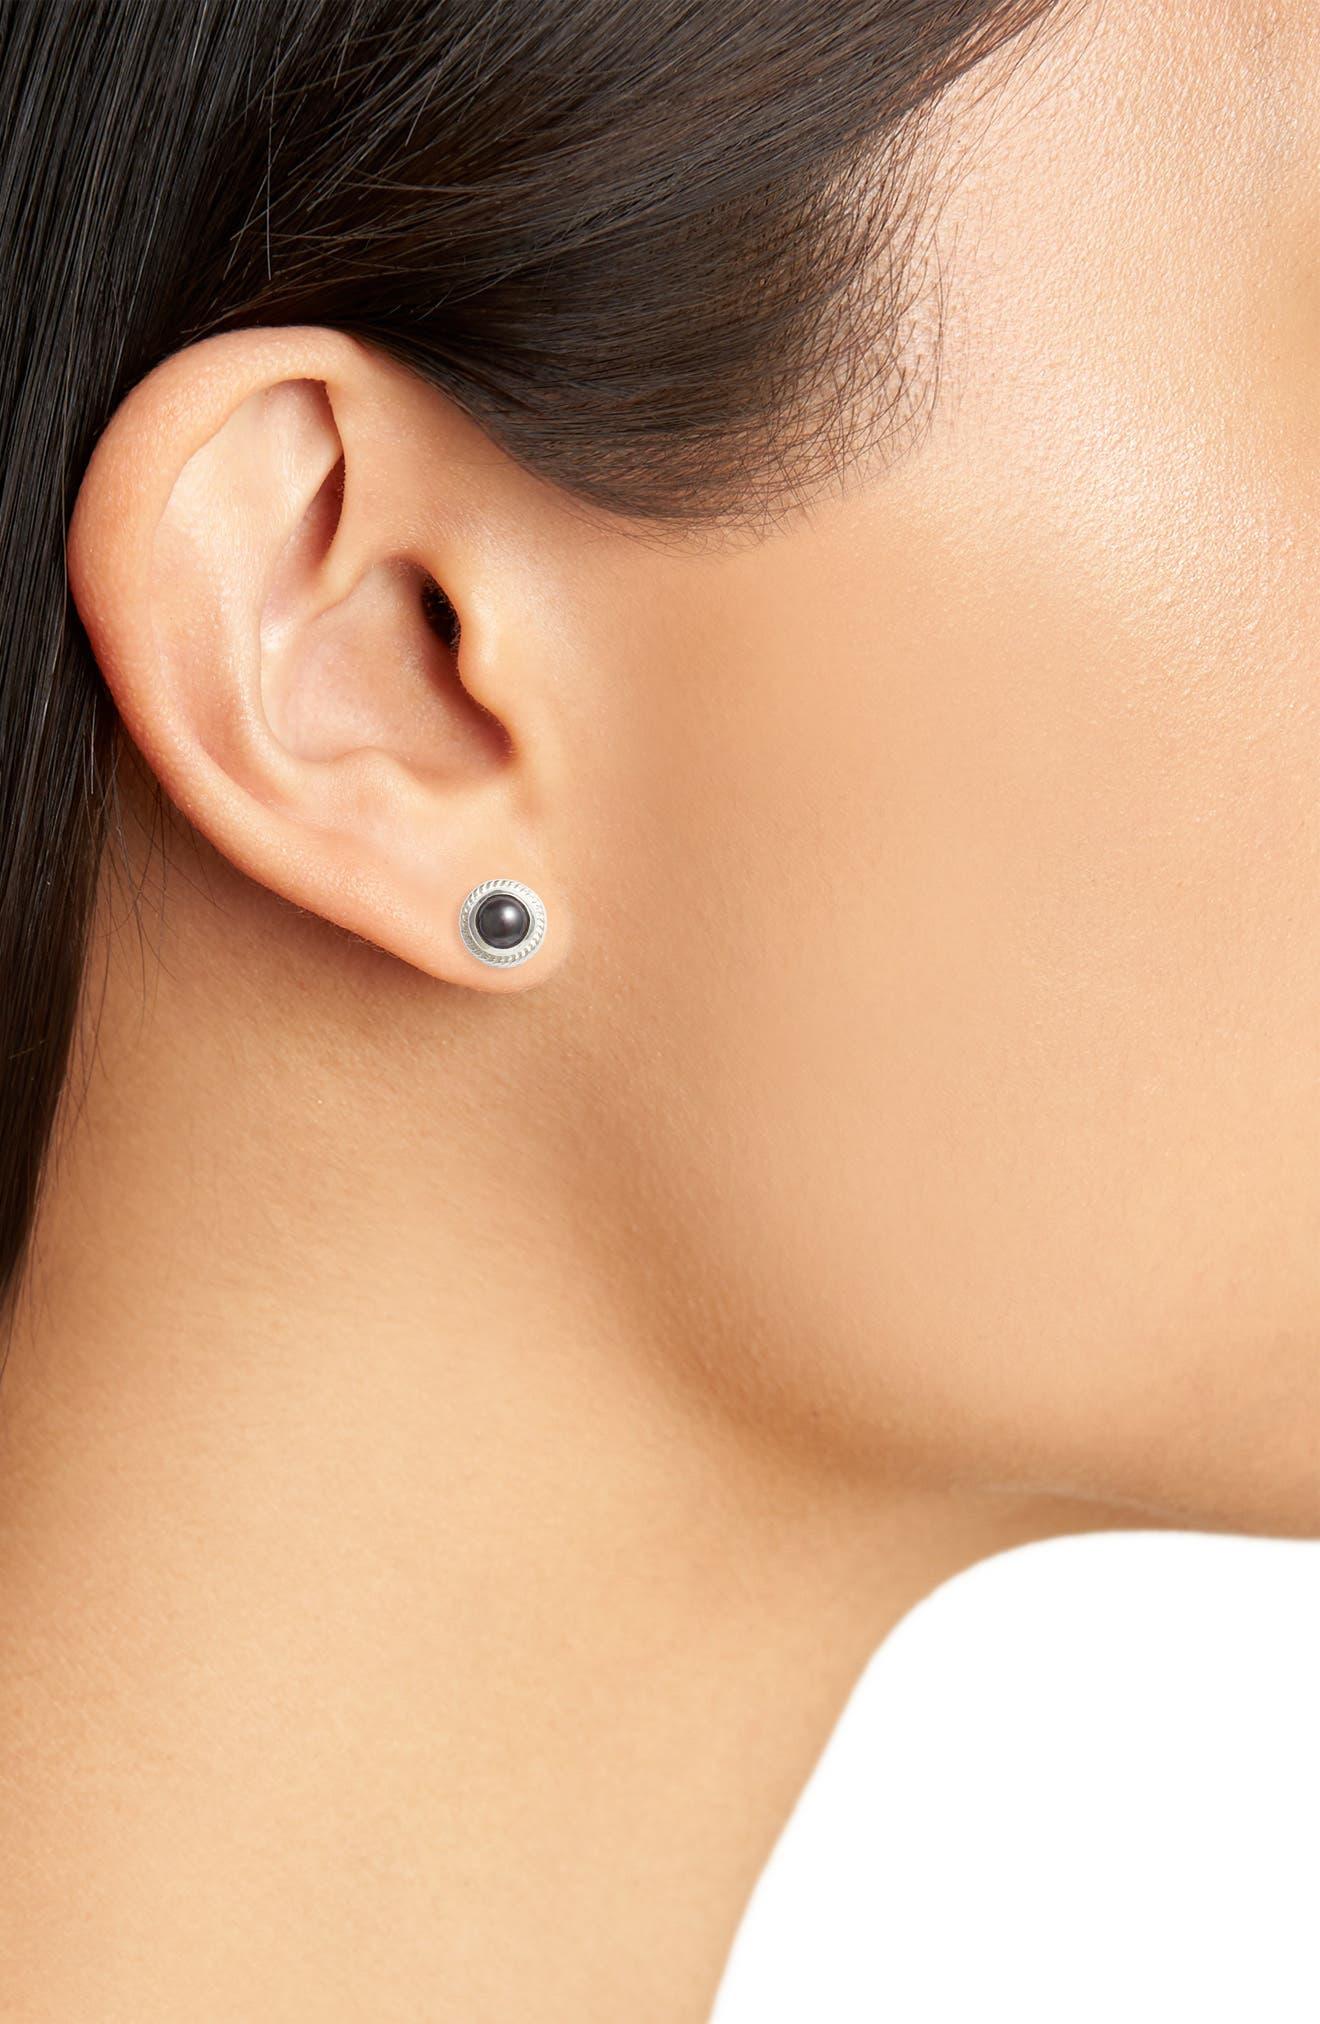 Genuine Blue Pearl Stud Earrings,                             Alternate thumbnail 4, color,